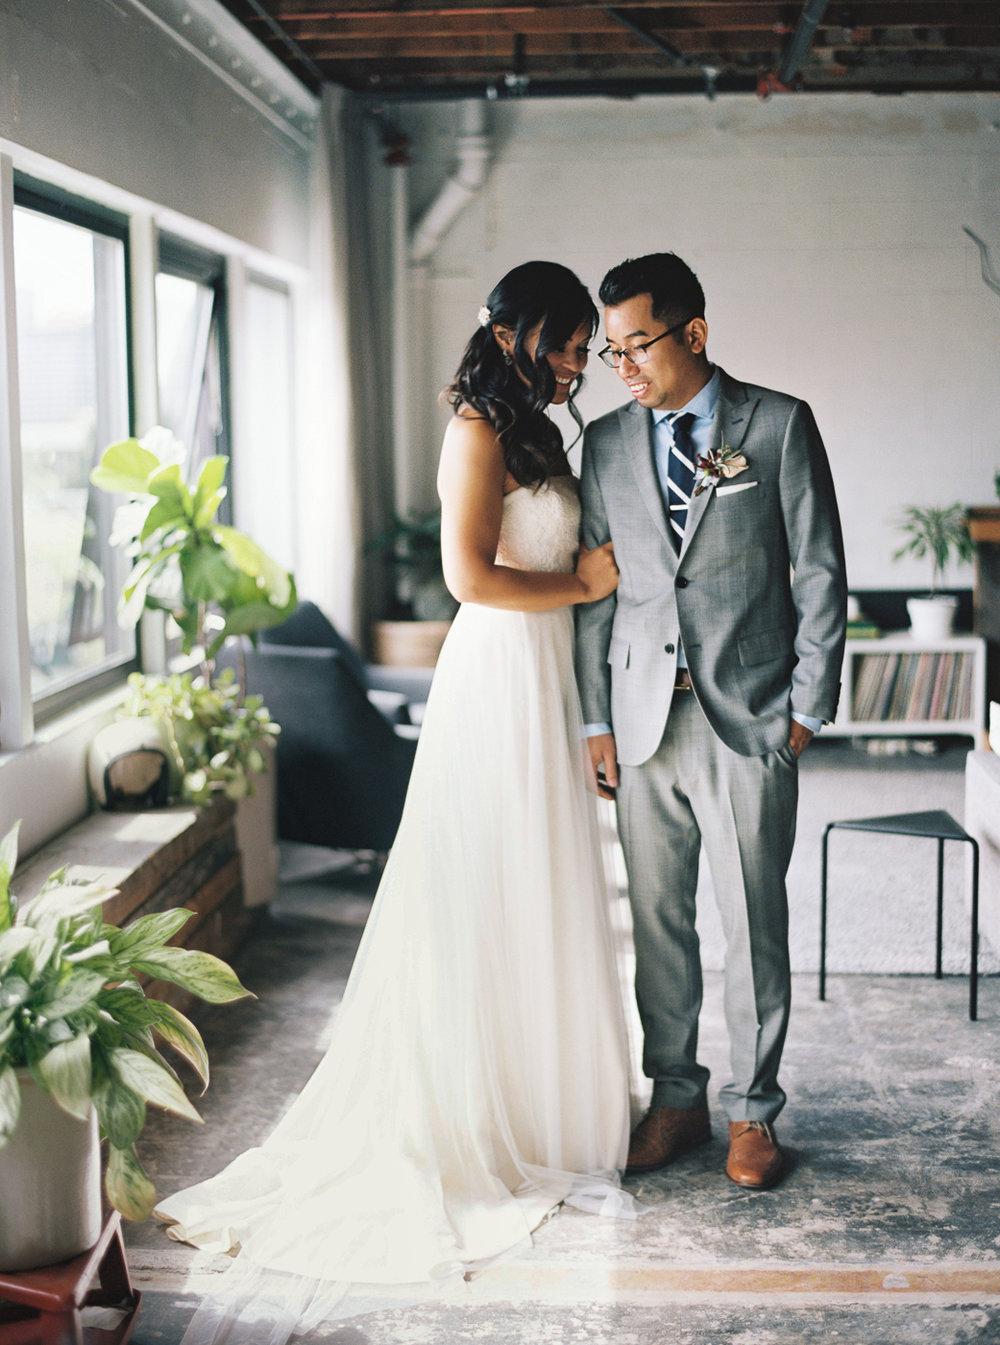 017Union_Pine_Portland_Oregon_Wedding_Photography.jpg